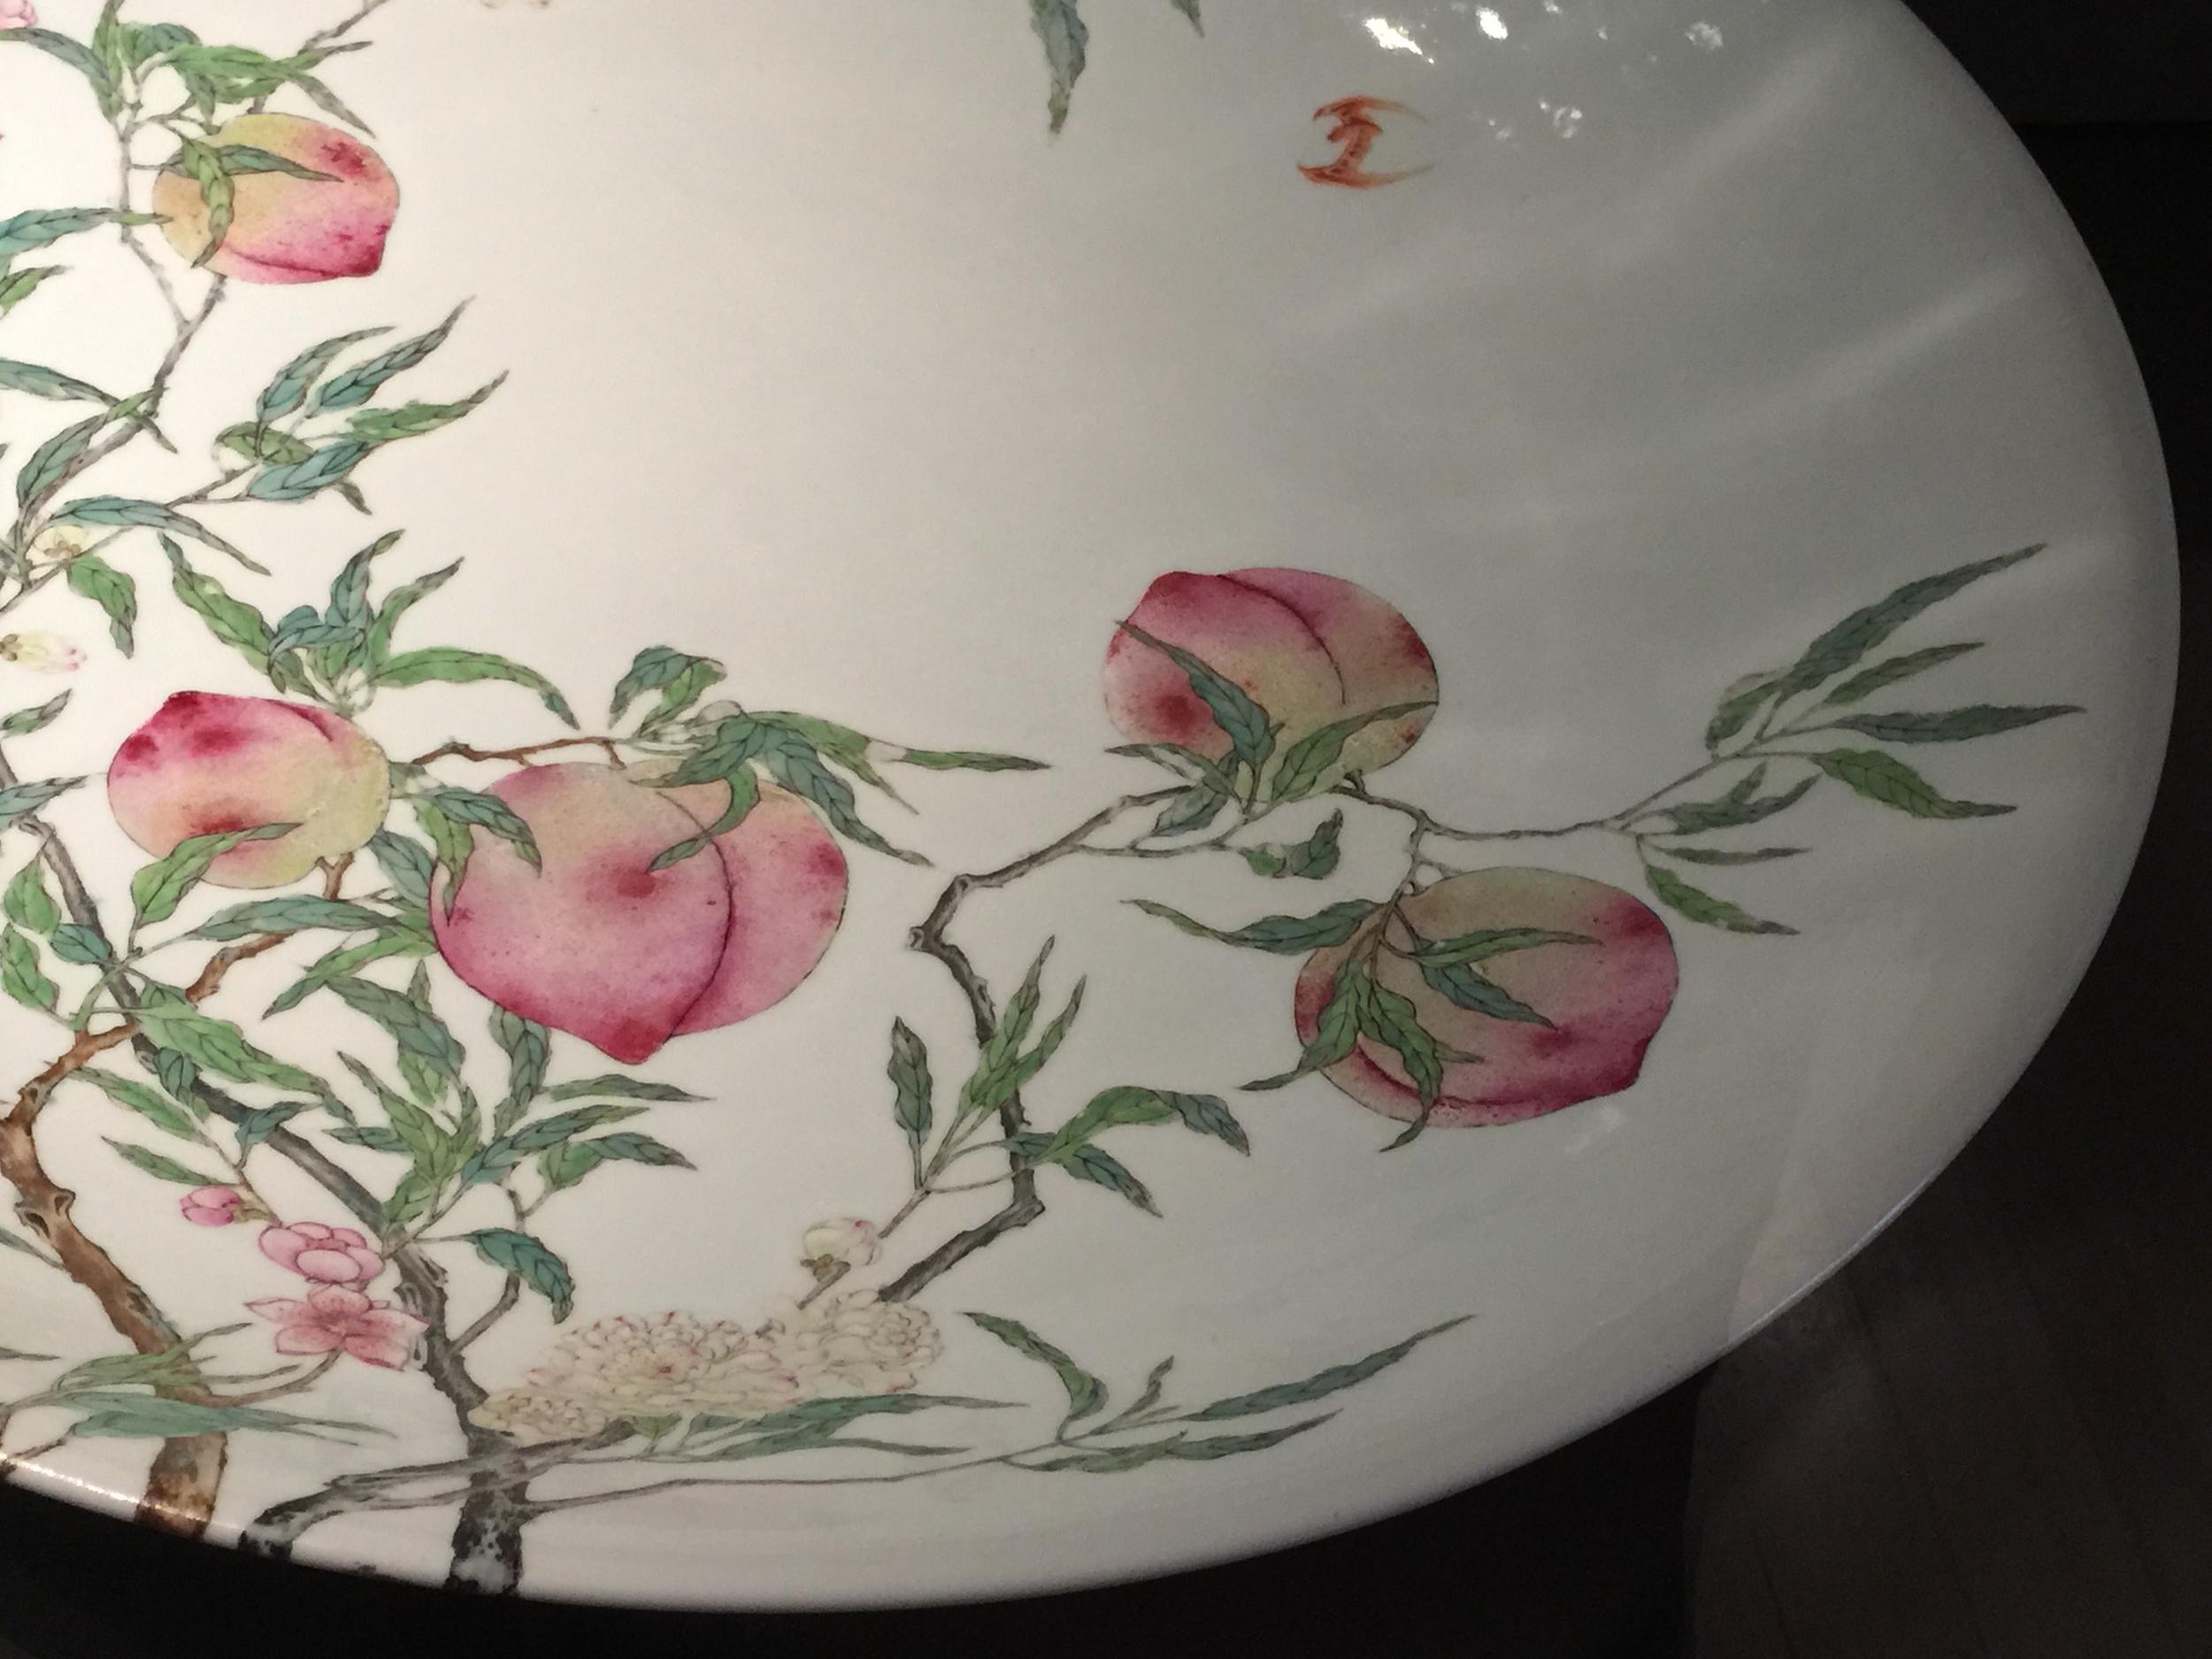 Chinese-Porcelain-British-Museum-Percival-David-jessewaugh.com-81.jpg